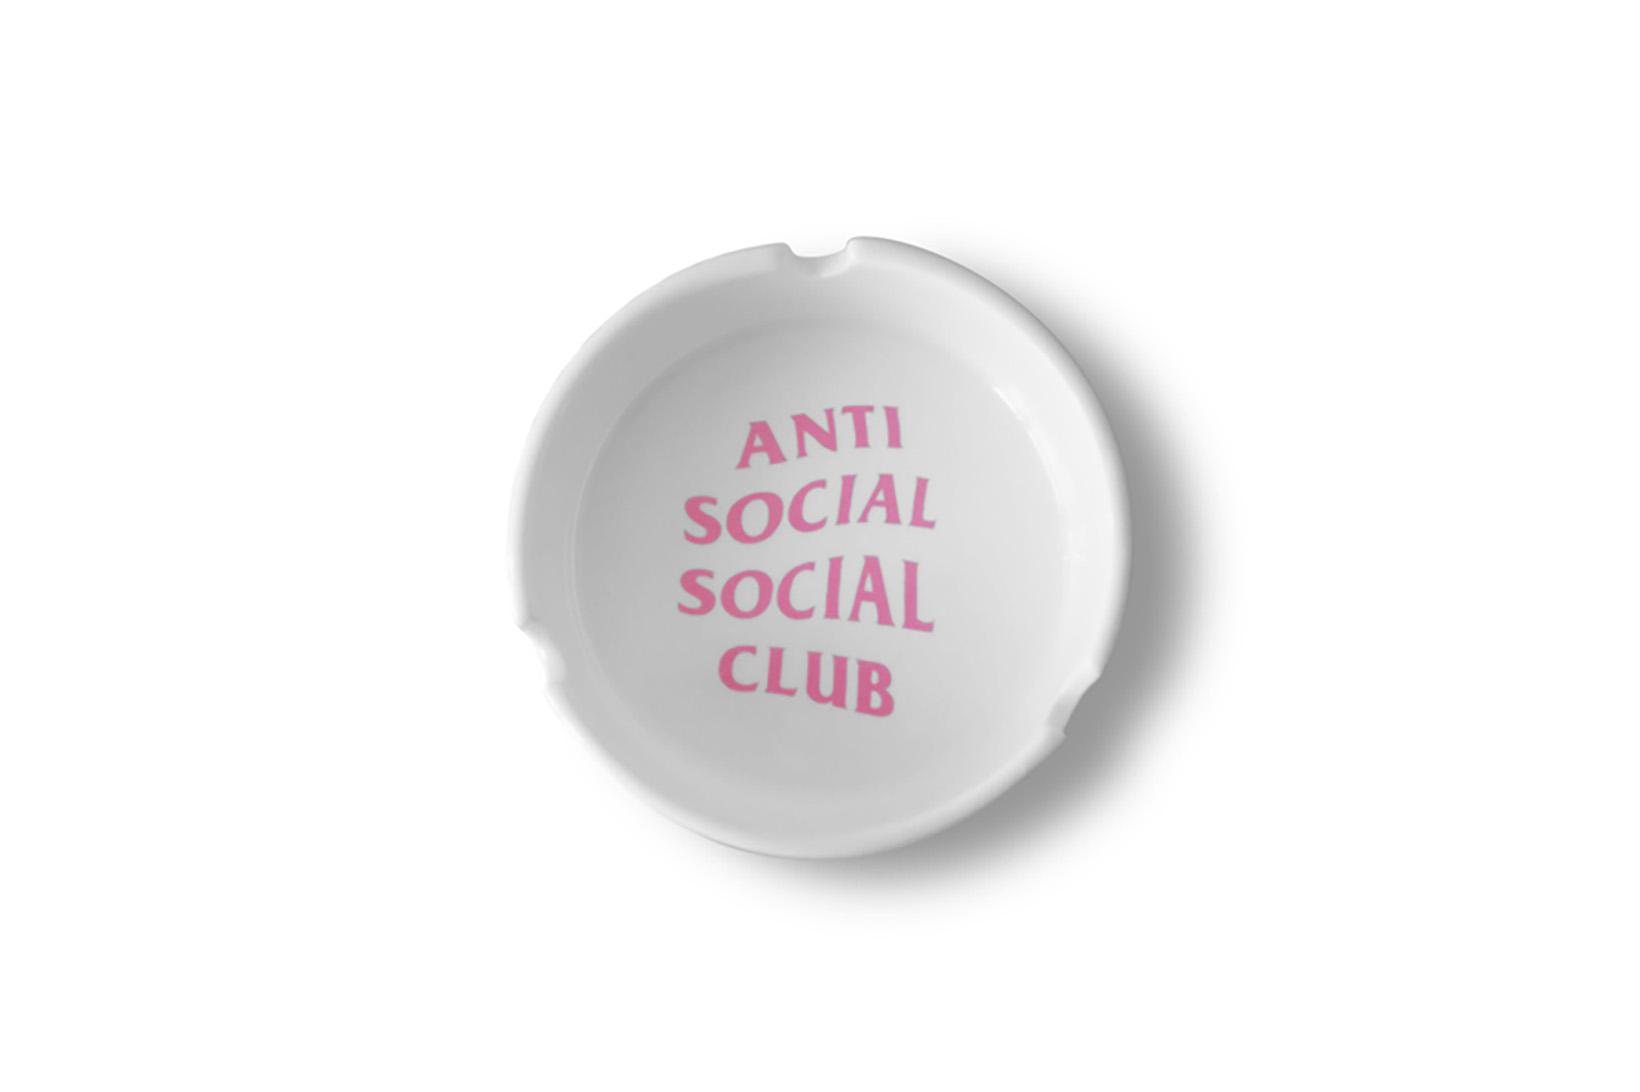 Anti Social Social Club 2017 Spring Summer - 3744369